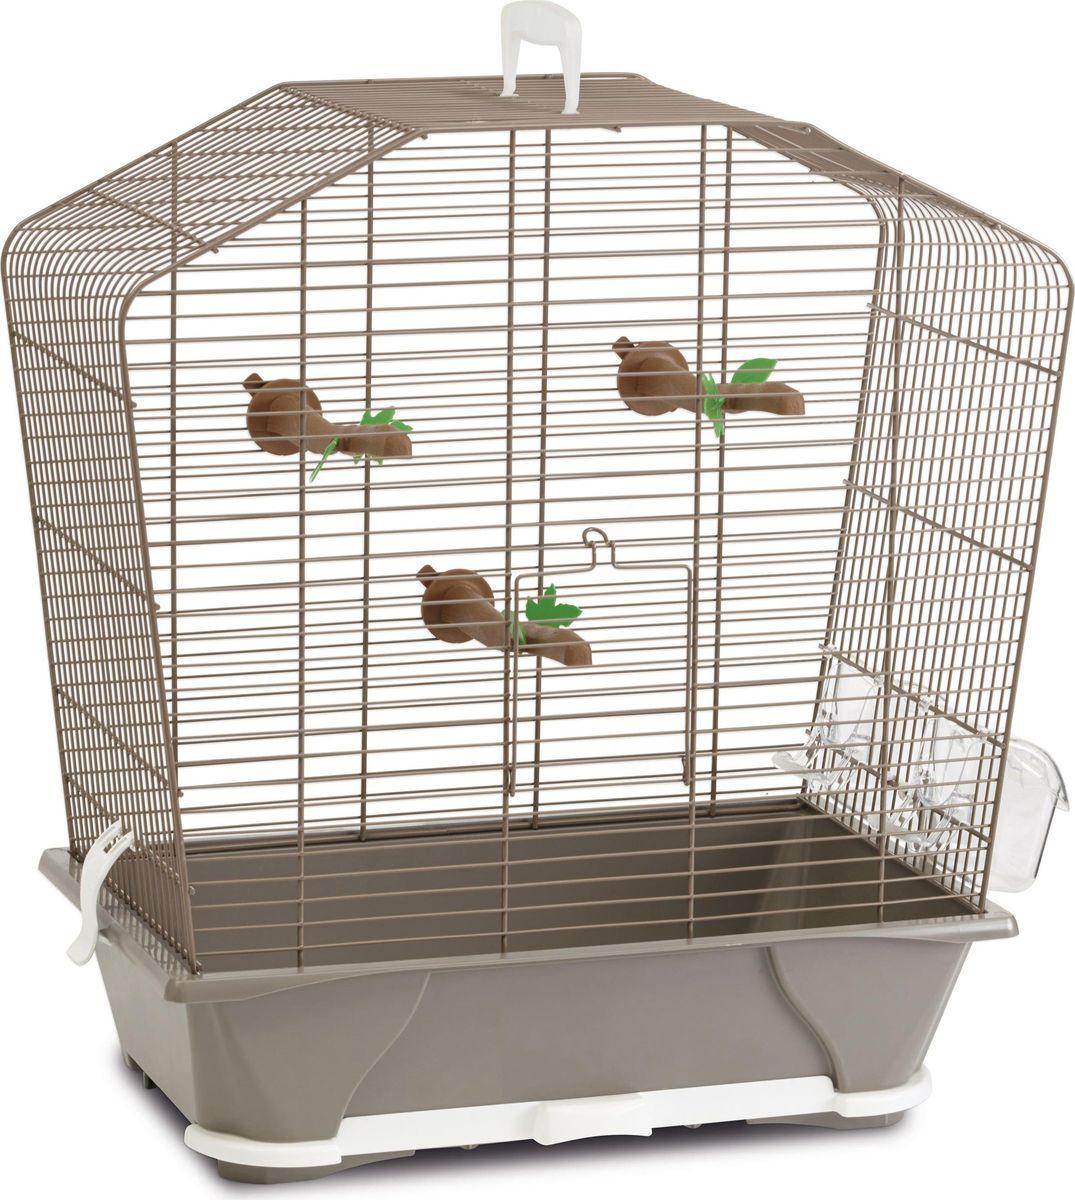 Клетка для птиц Savic  Camille , цвет: бежевый, 45 х 25 х 48 см - Клетки, вольеры, будки